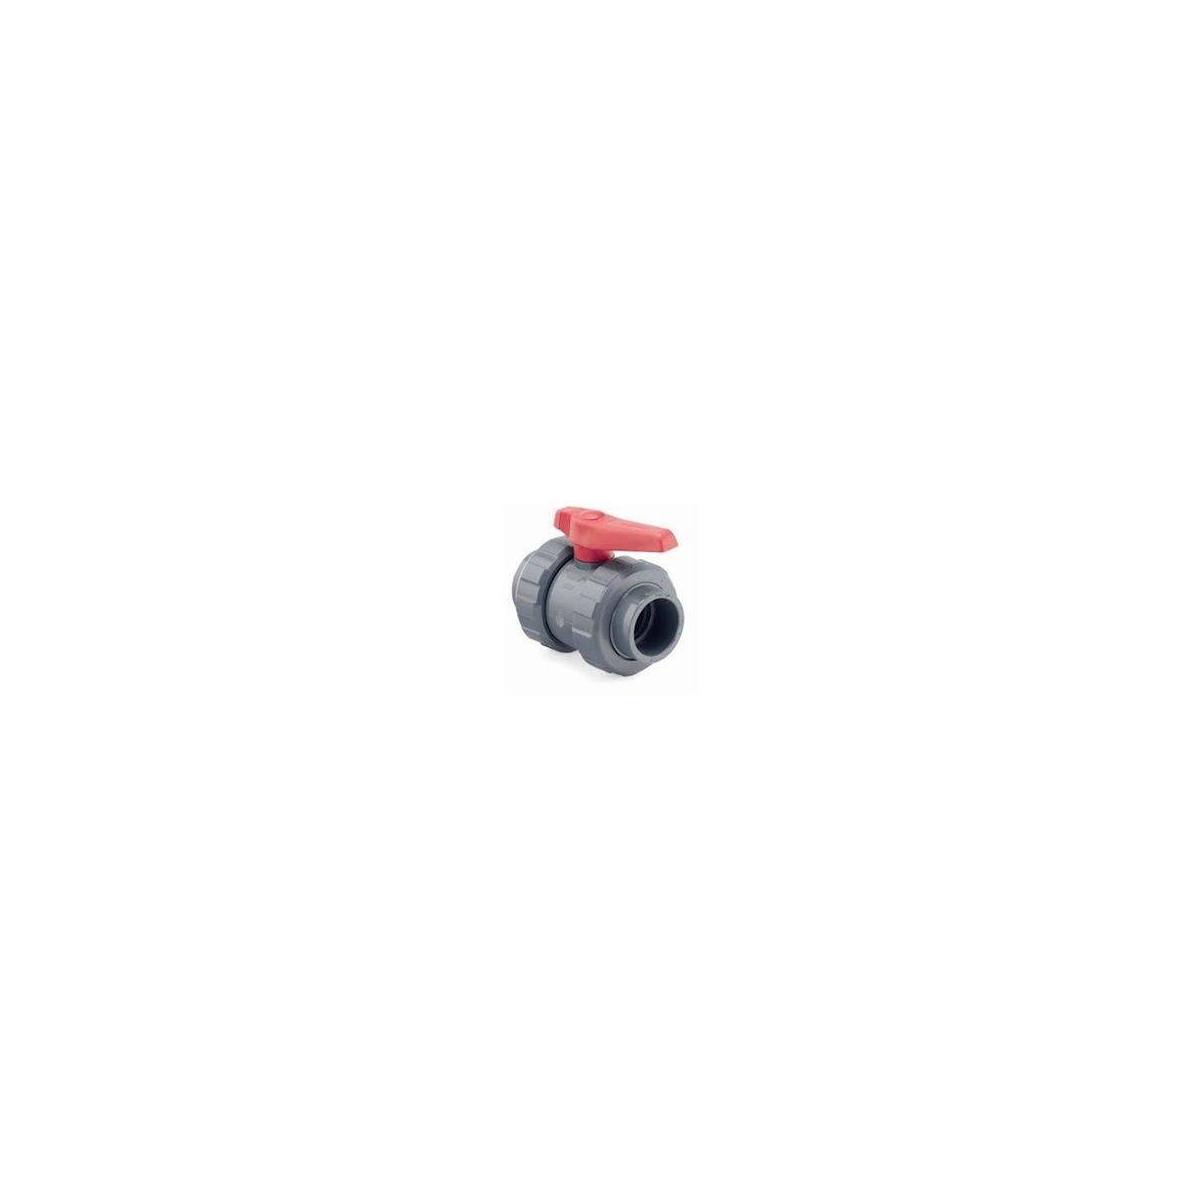 PVC-U [STD] BALL VALVE (PE-EPDM) solvent socket